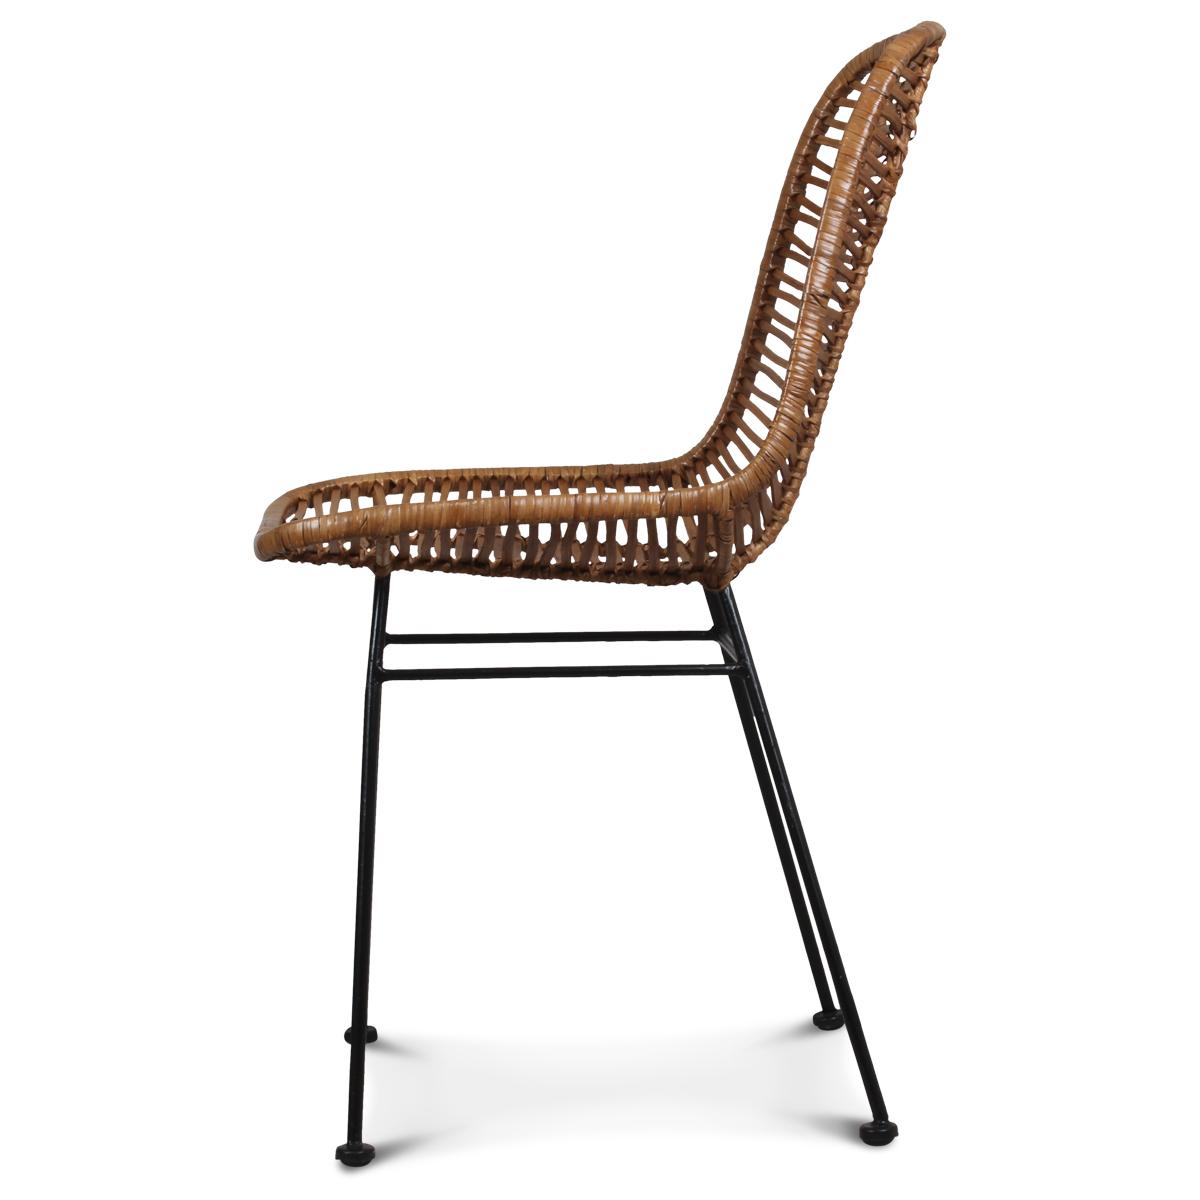 Chaise design metal et rotin MALAKA - Demeure et Jardin